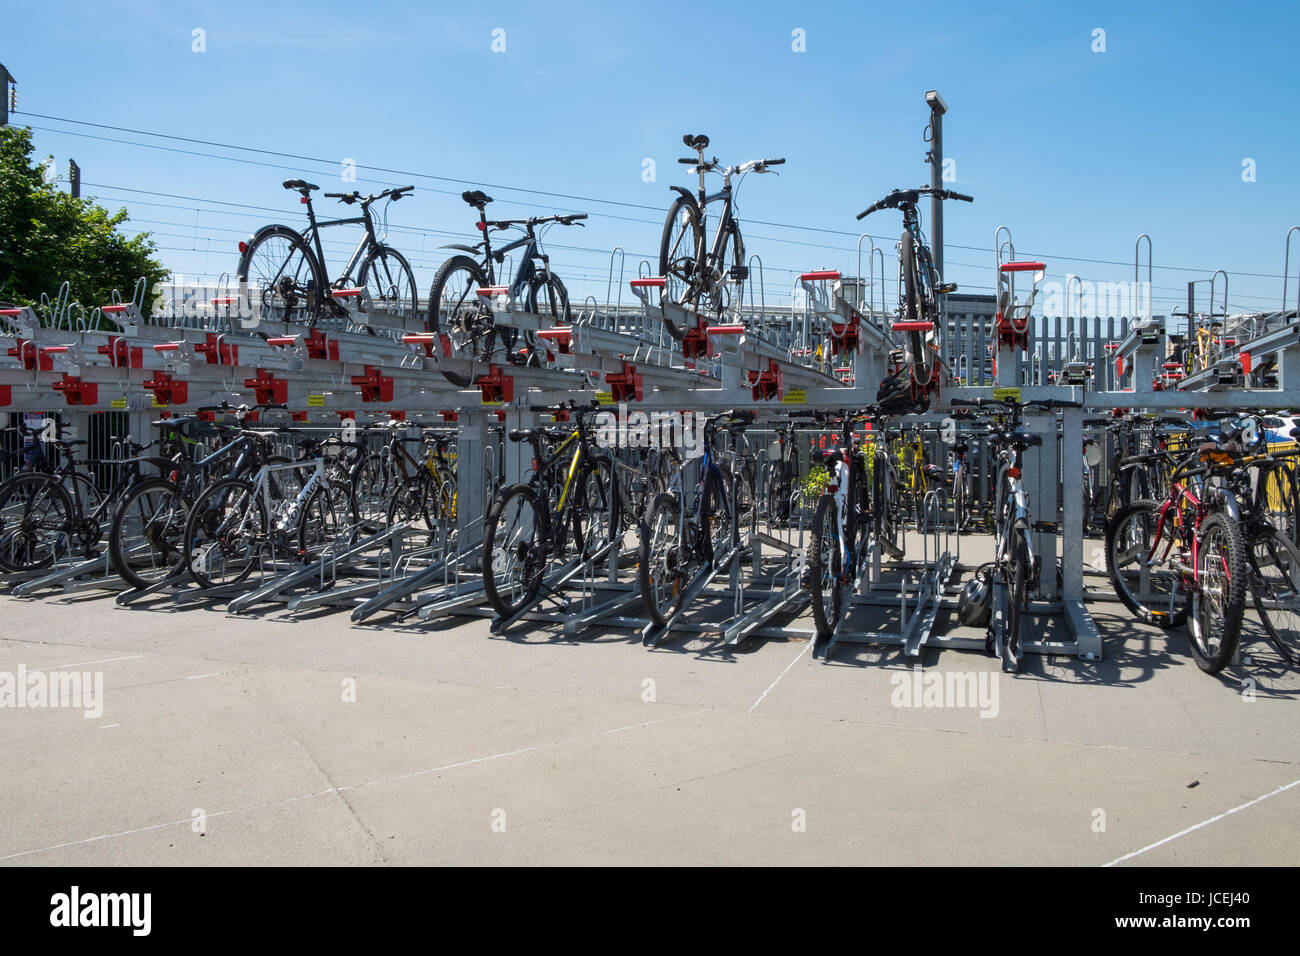 Bike cycle hub secure parking located at Ashford train station, uk - Stock Image